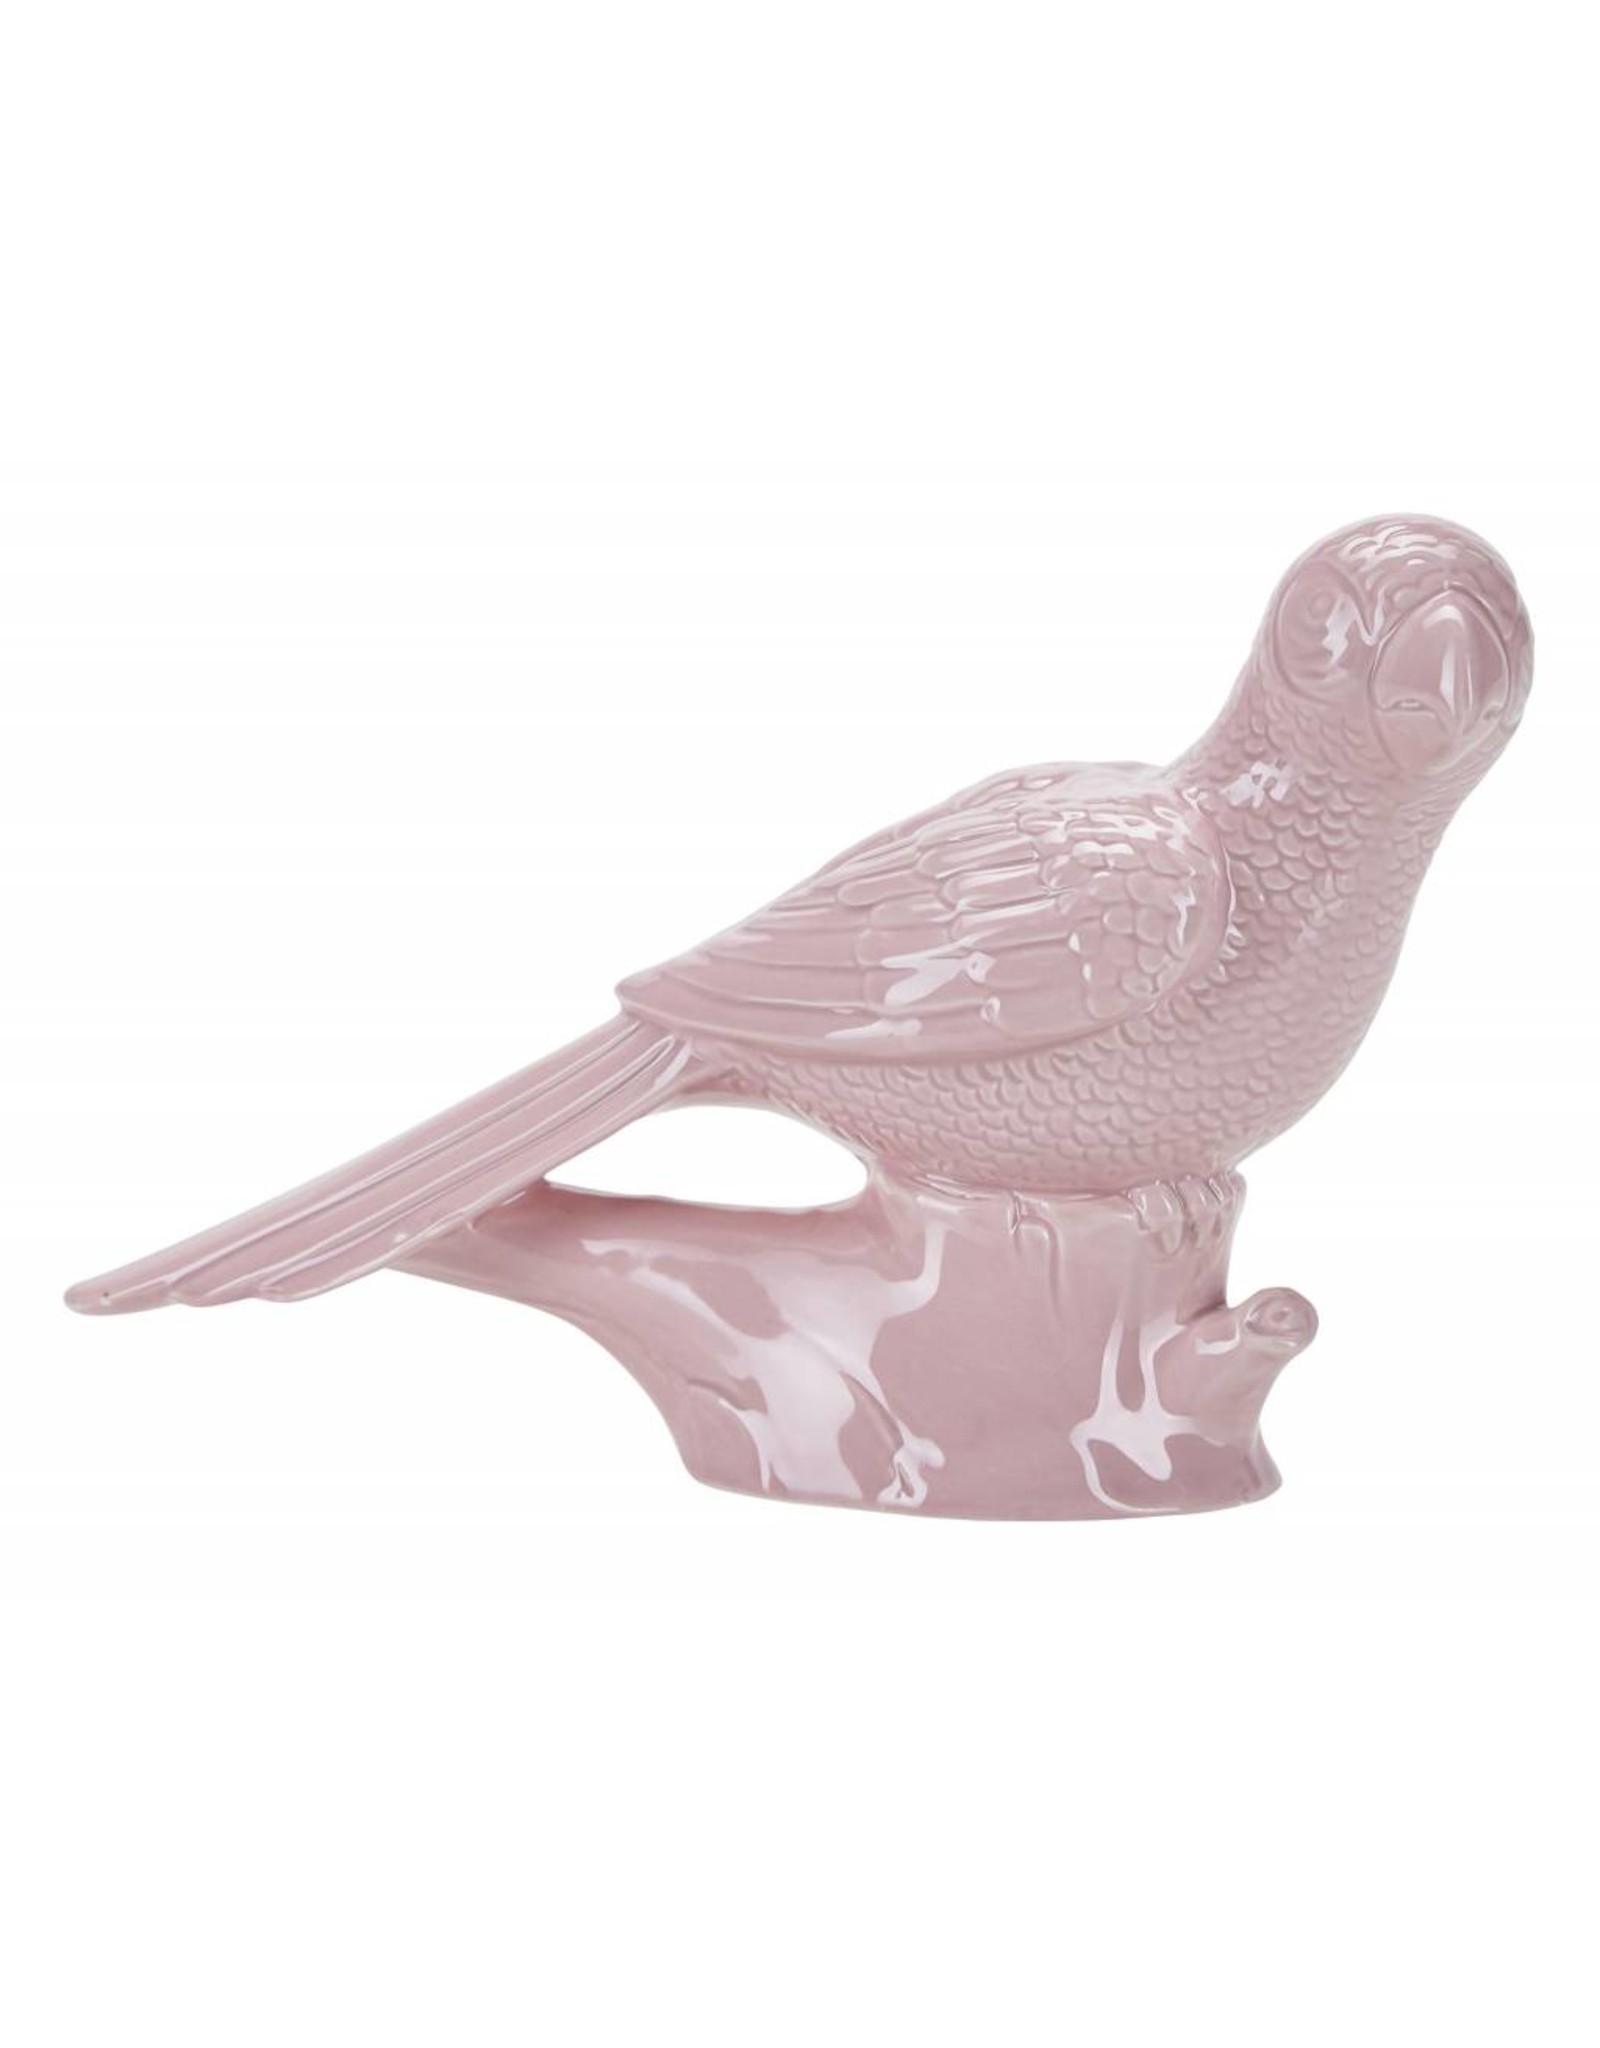 Miss Etoile CF002 Decoratie - Papegaai Staand Roze